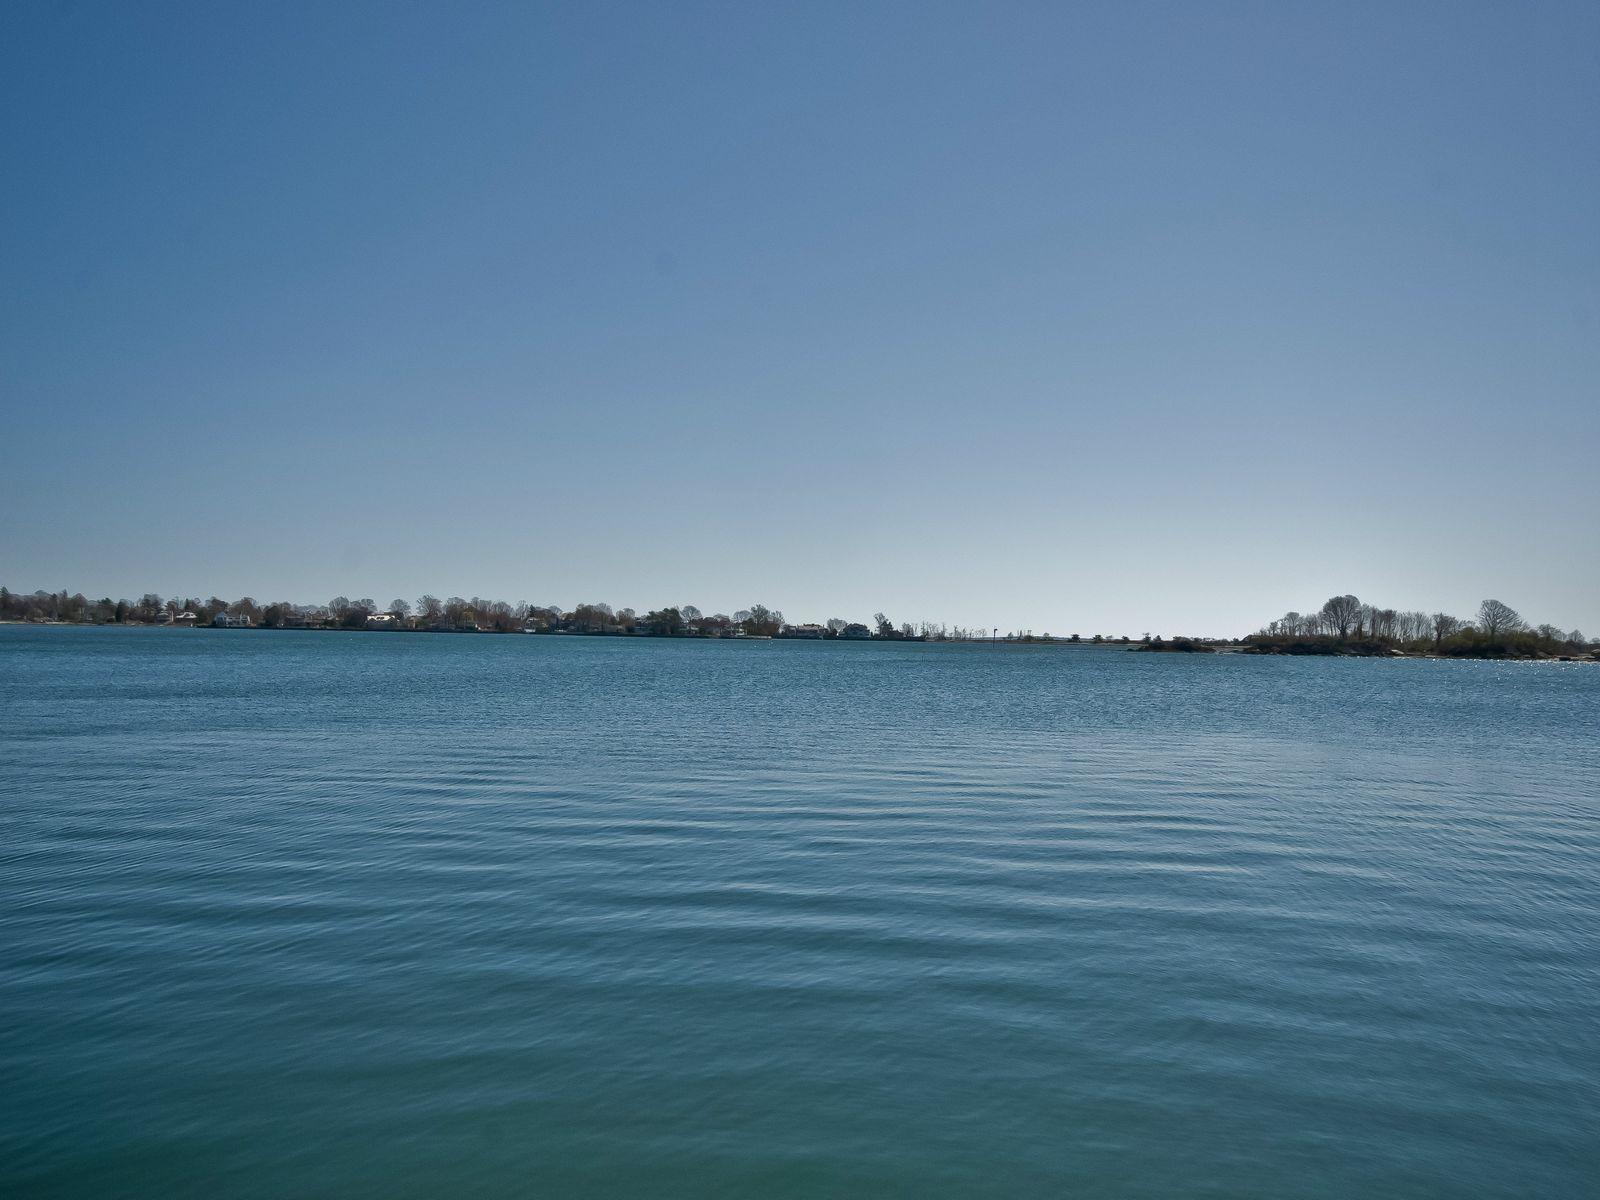 Picturesque in Riverside